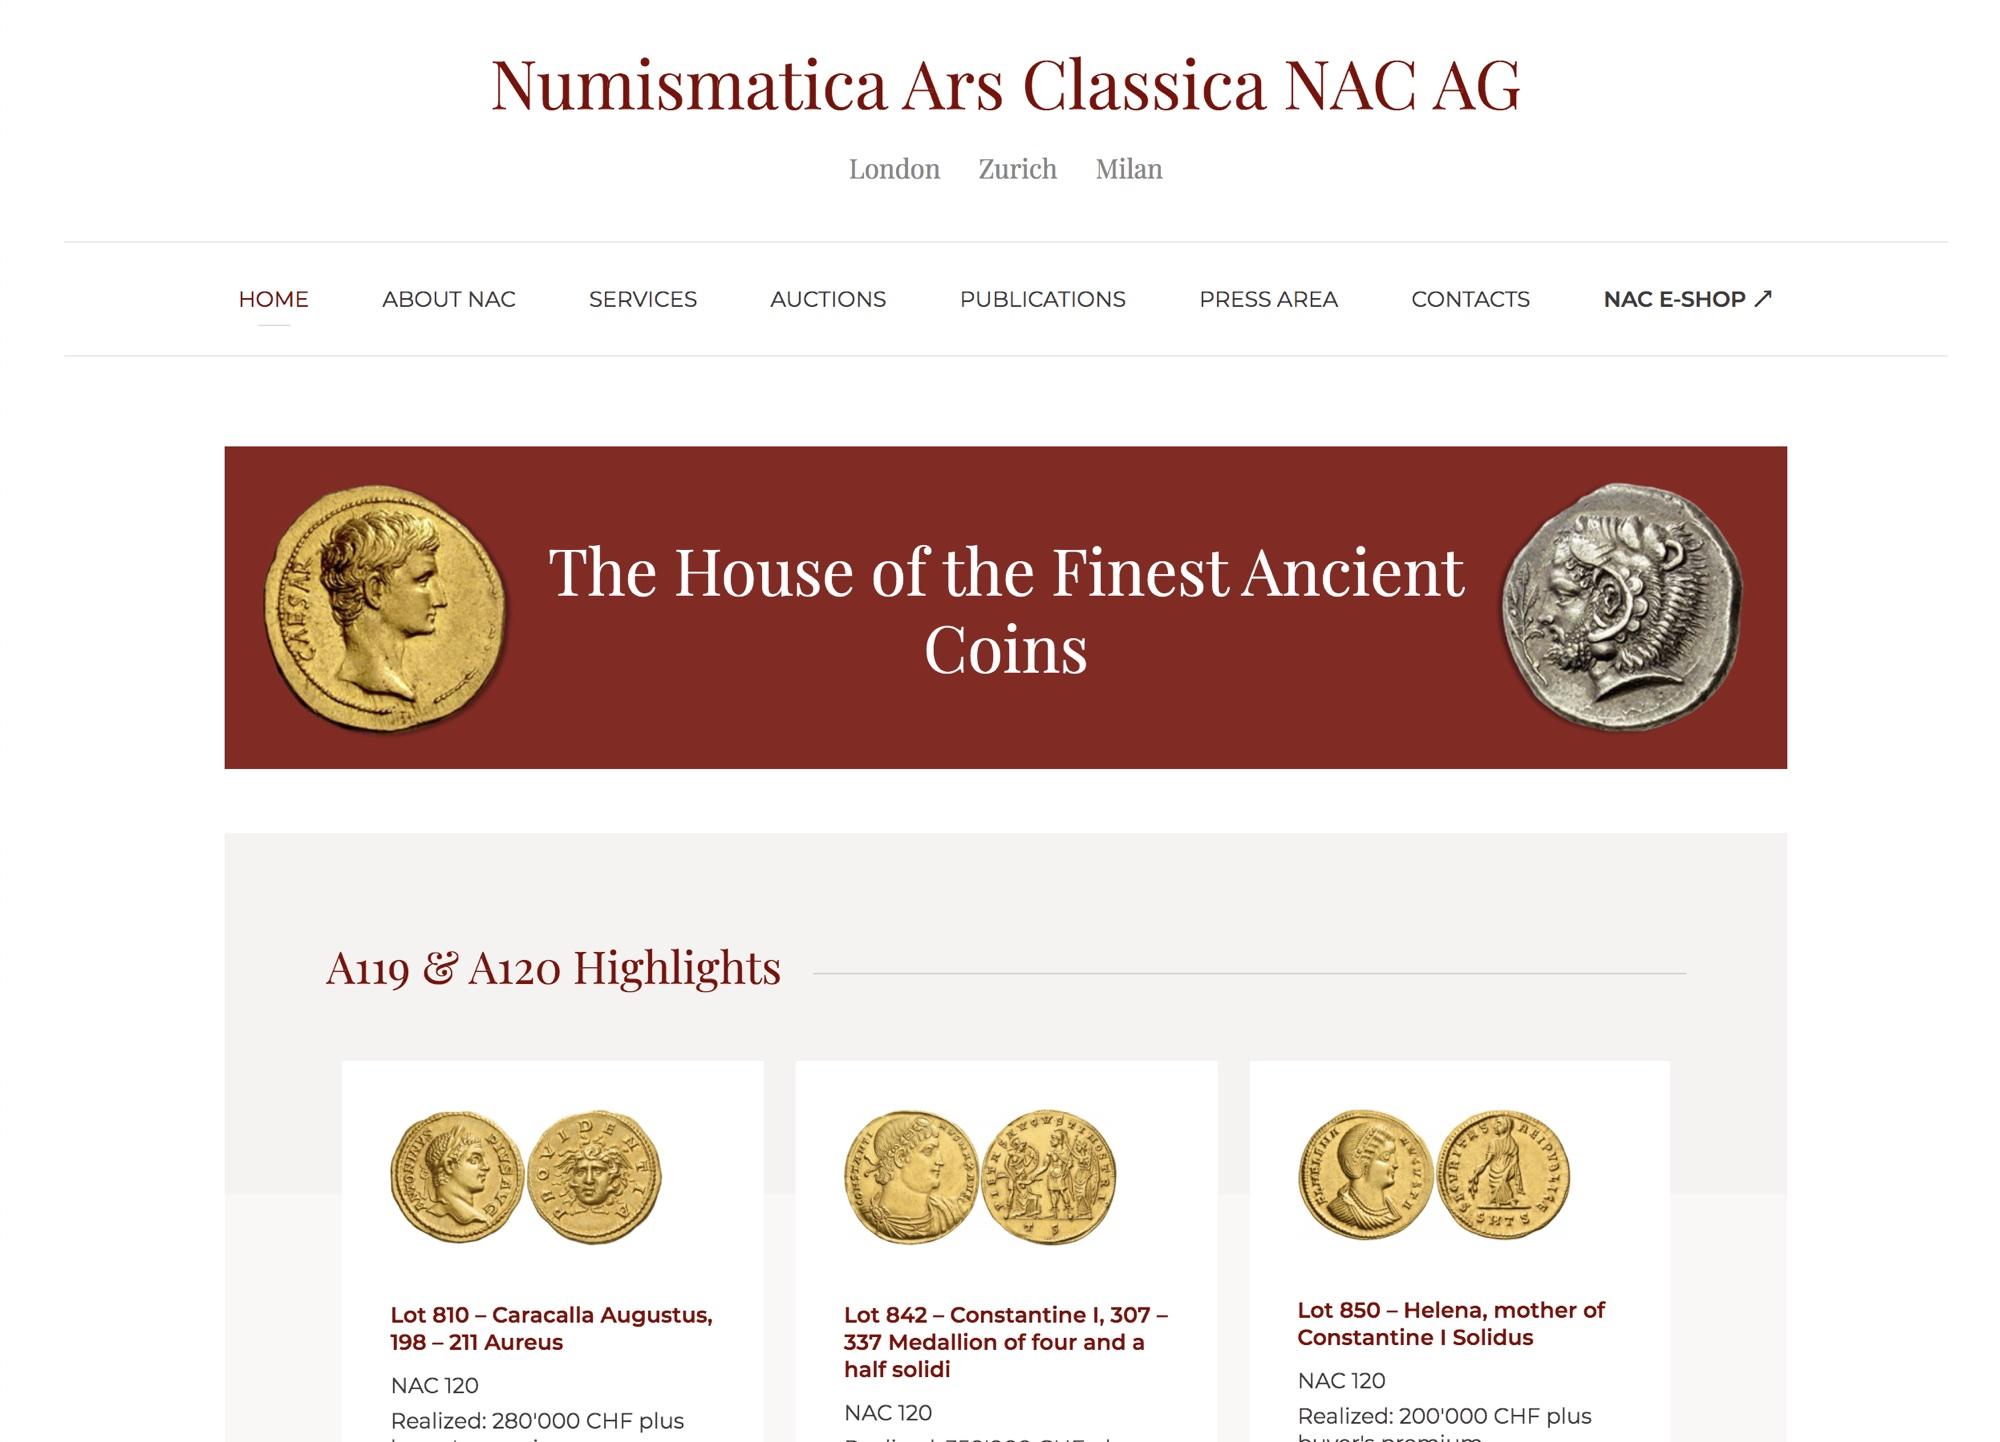 Numismatica Ars Classica NAC AG